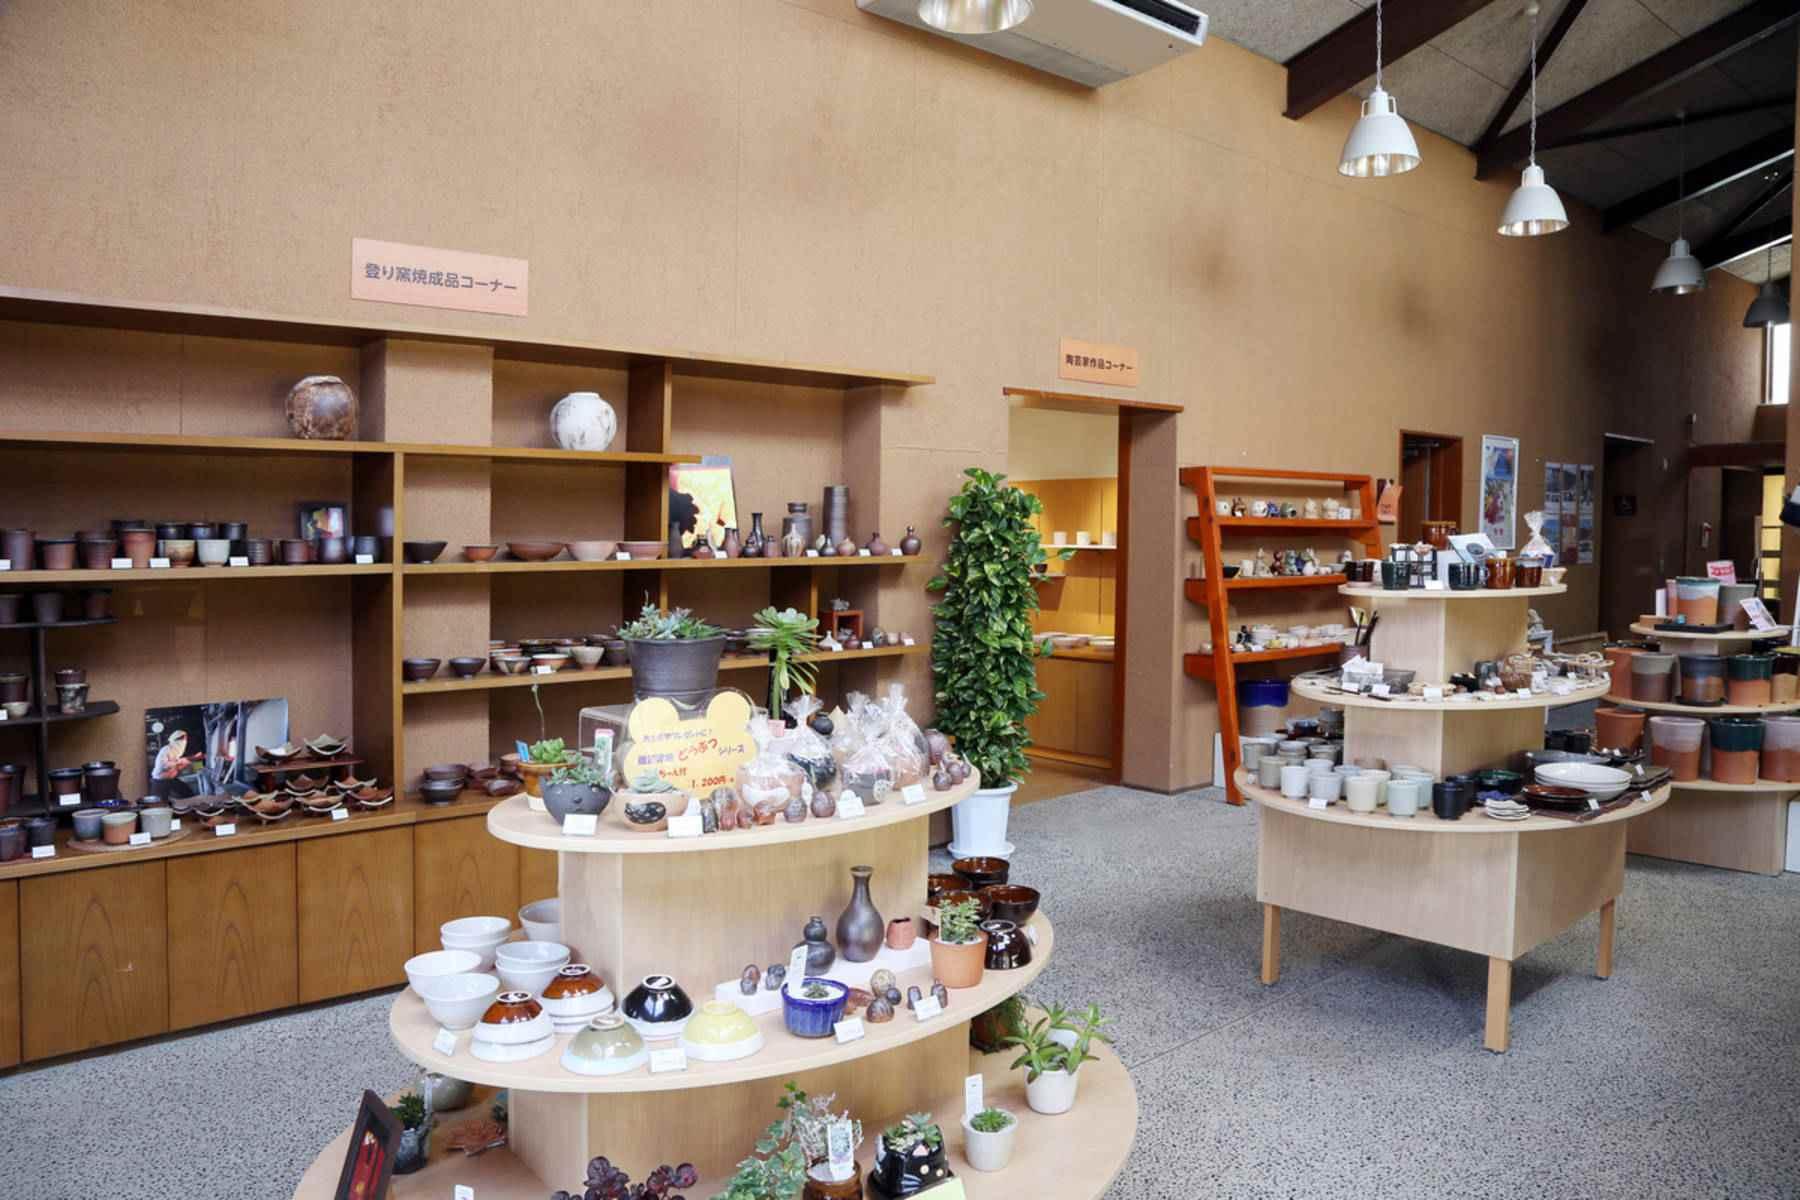 Interior of Maishima Pottery Museum